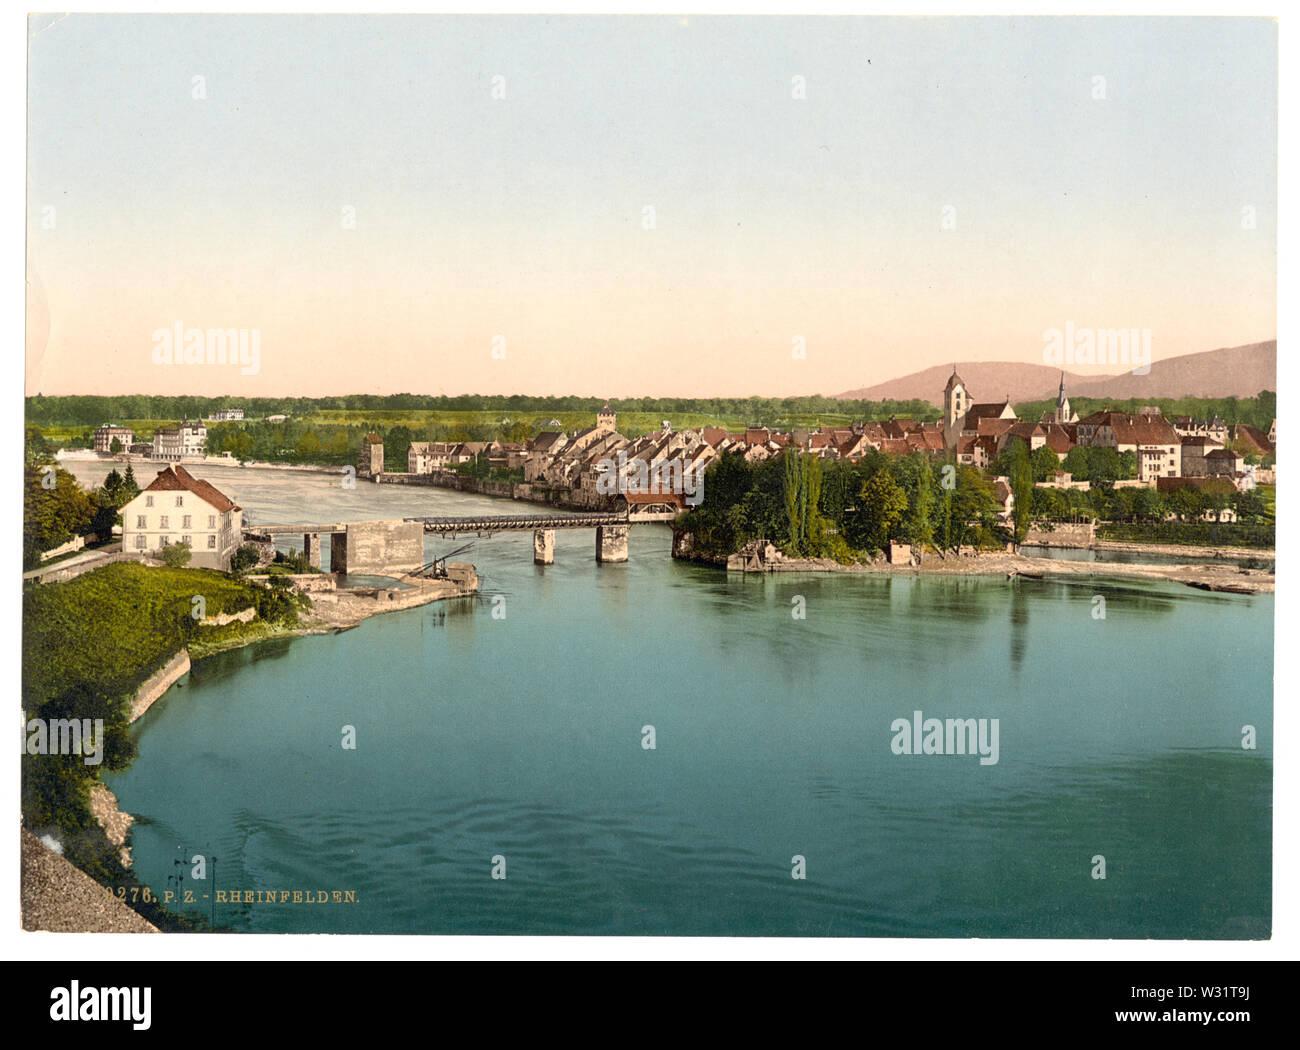 Rheinfelden, Canton of Aargau, Switzerland and Rheinfelden (Baden), Germany, River RhineDeutsch: Rheinfelden, Aargau, Schweiz und Rheinfelsen (Baden), Deutschland, Rhein - Stock Image